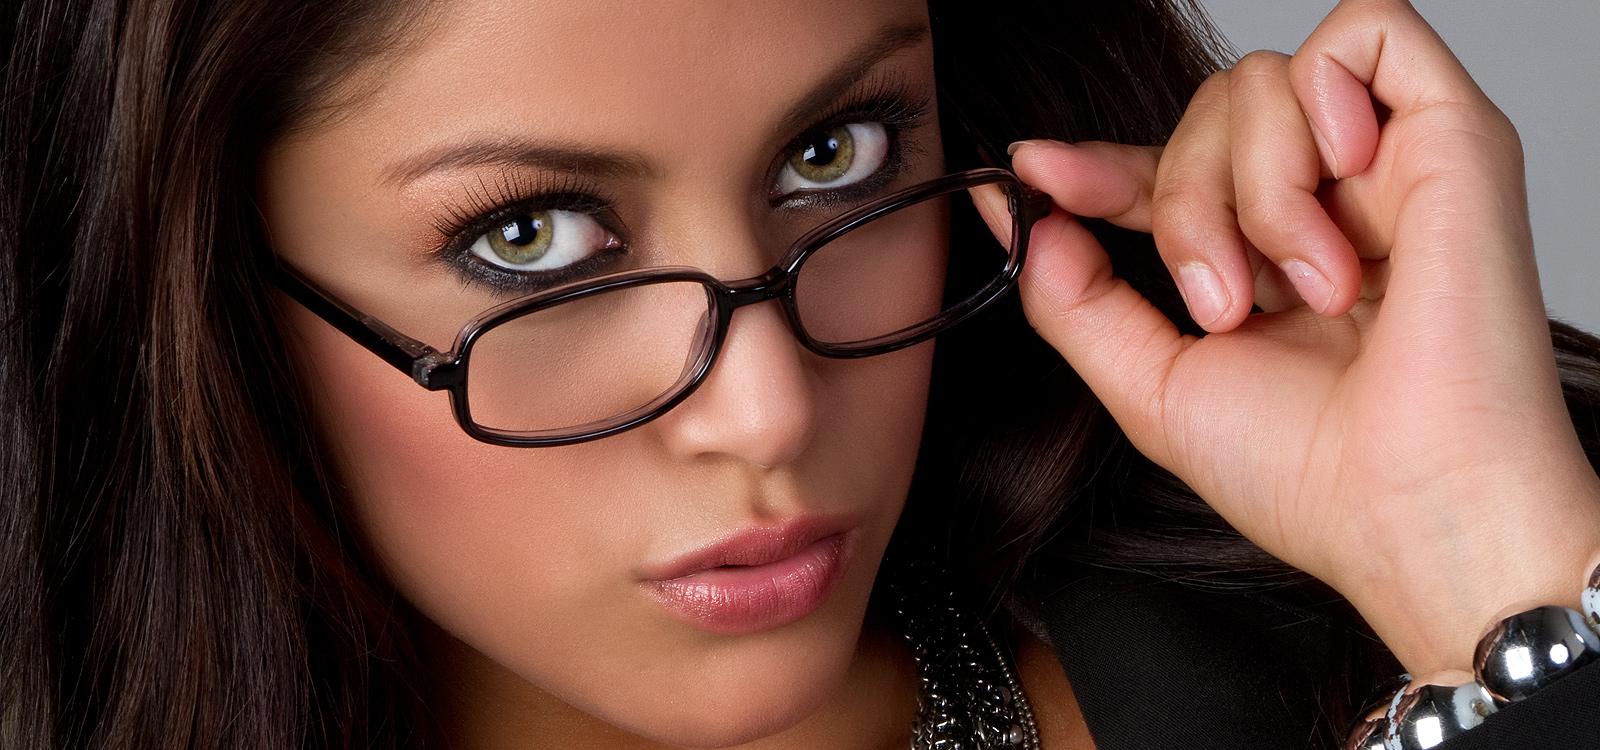 <div class='slider_caption'> <h1>Strenge Lehrerinnen erziehen Dich direkt am Hörer.</h1><a class='slider-readmore' href='http://www.domina-telefonsex.ch/lehrerin/'>Weiterlesen</a> </div>